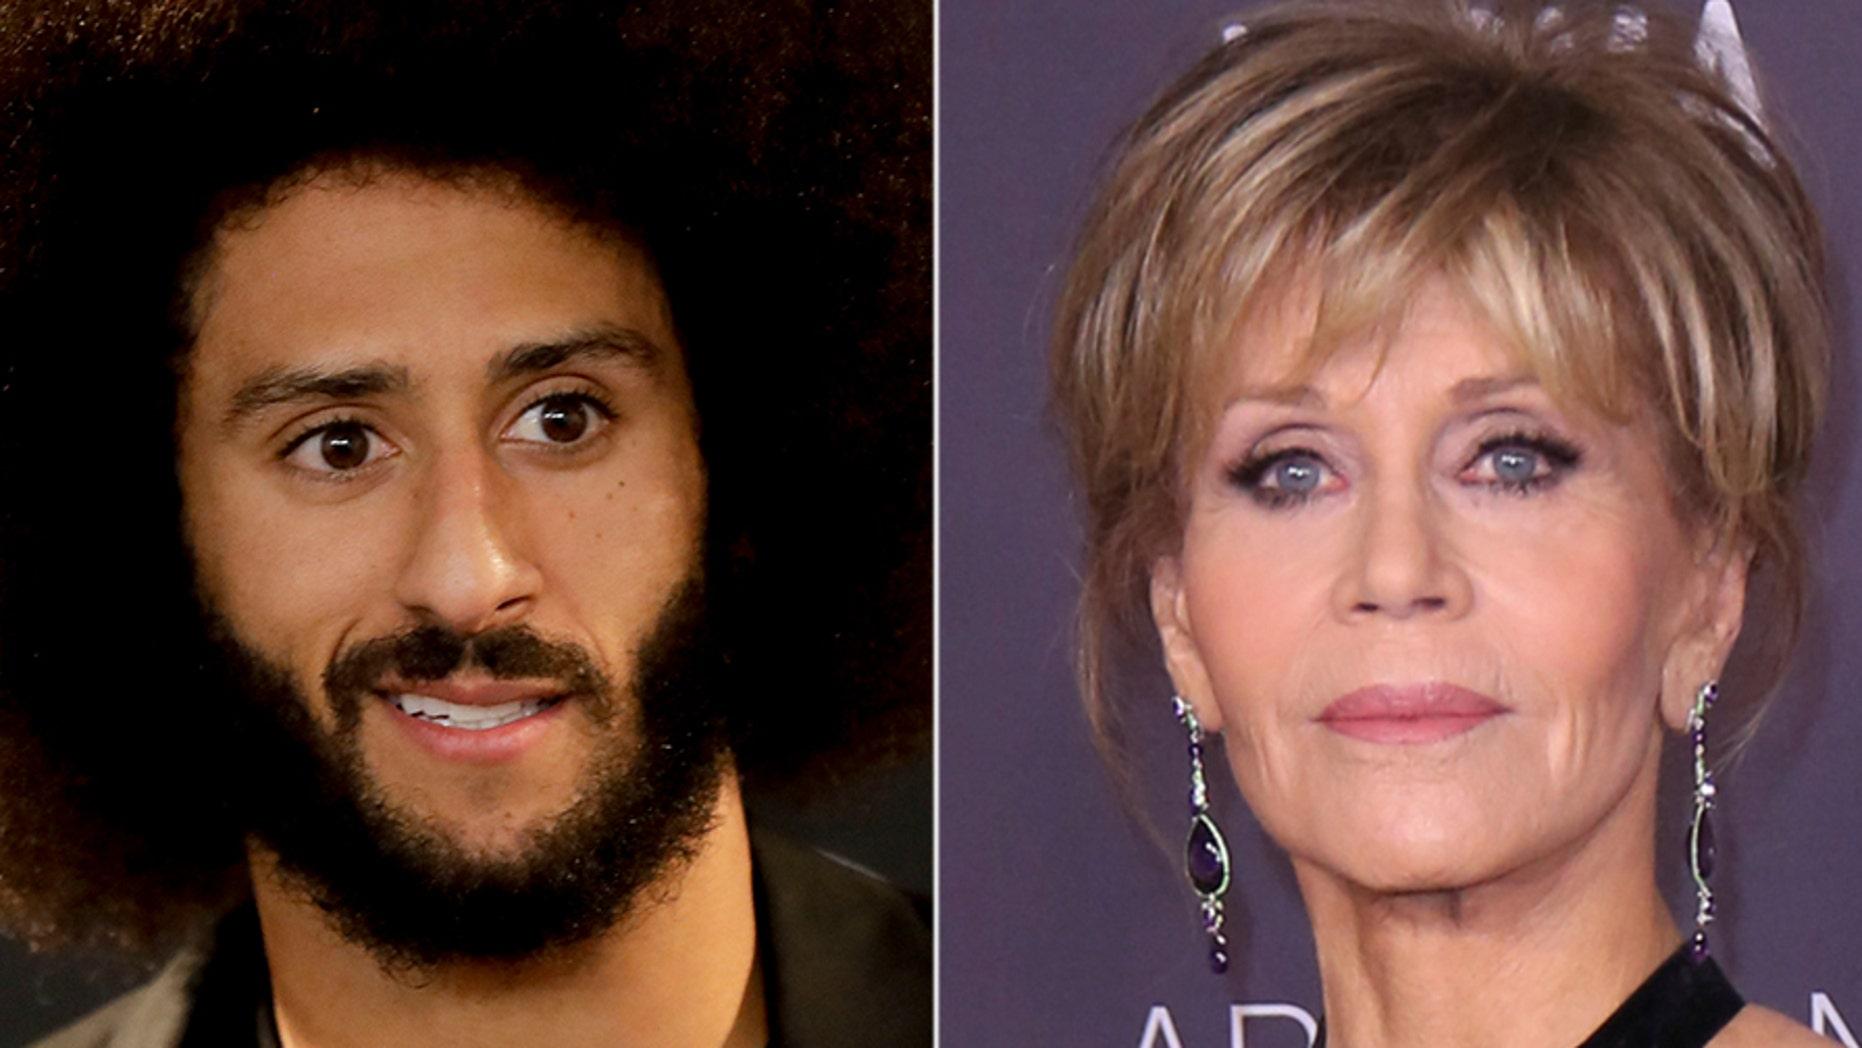 Colin Kaepernick and Jane Fonda